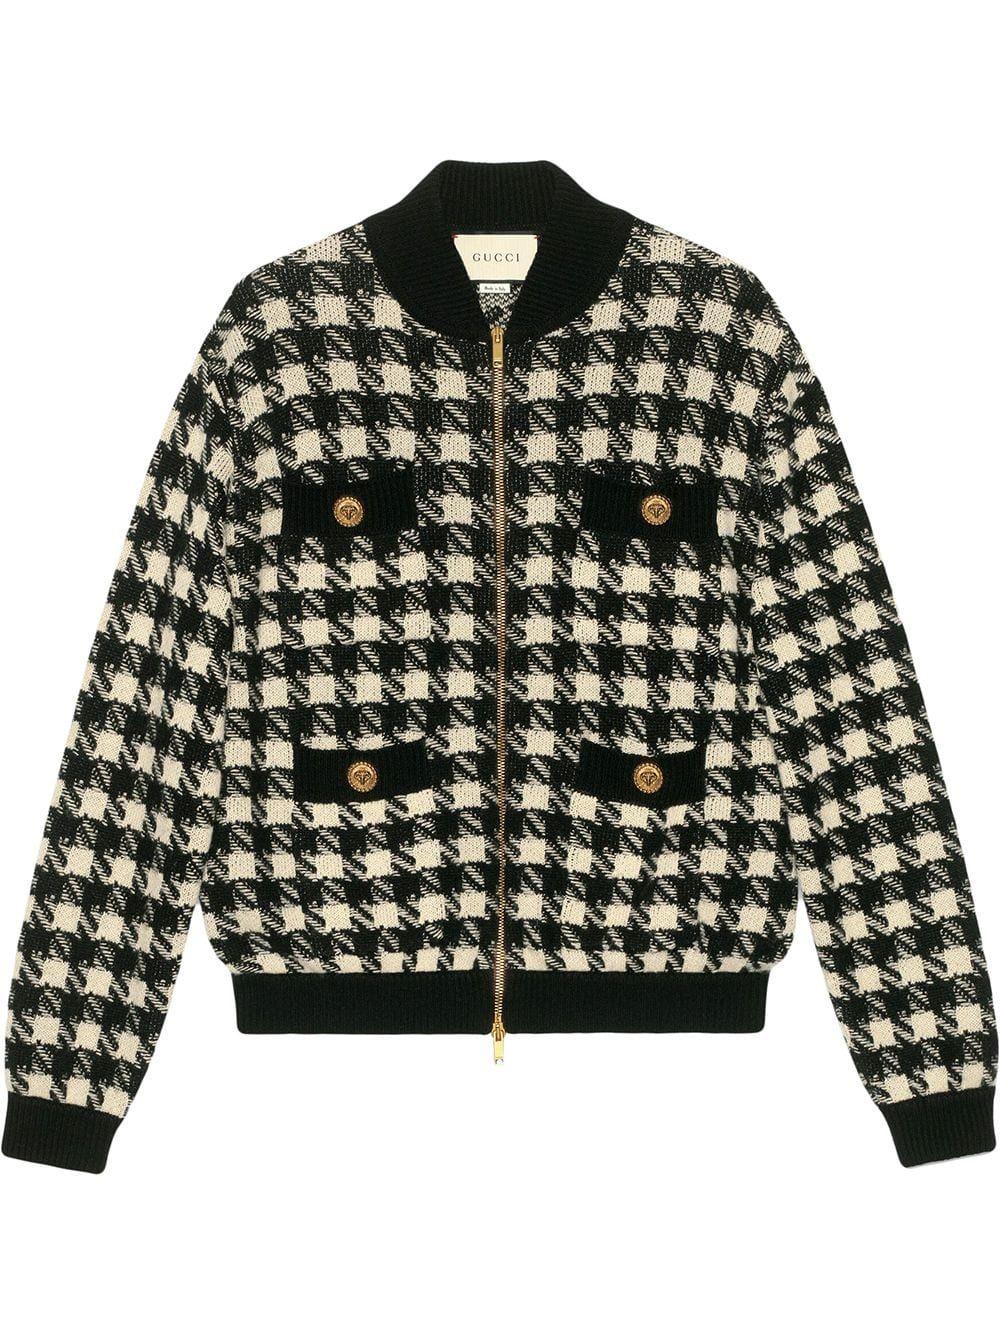 Gucci Houndstooth Pattern Bomber Jacket Farfetch Gaya Busana Gaya Model Pakaian Gaya Berpakaian [ 1334 x 1000 Pixel ]